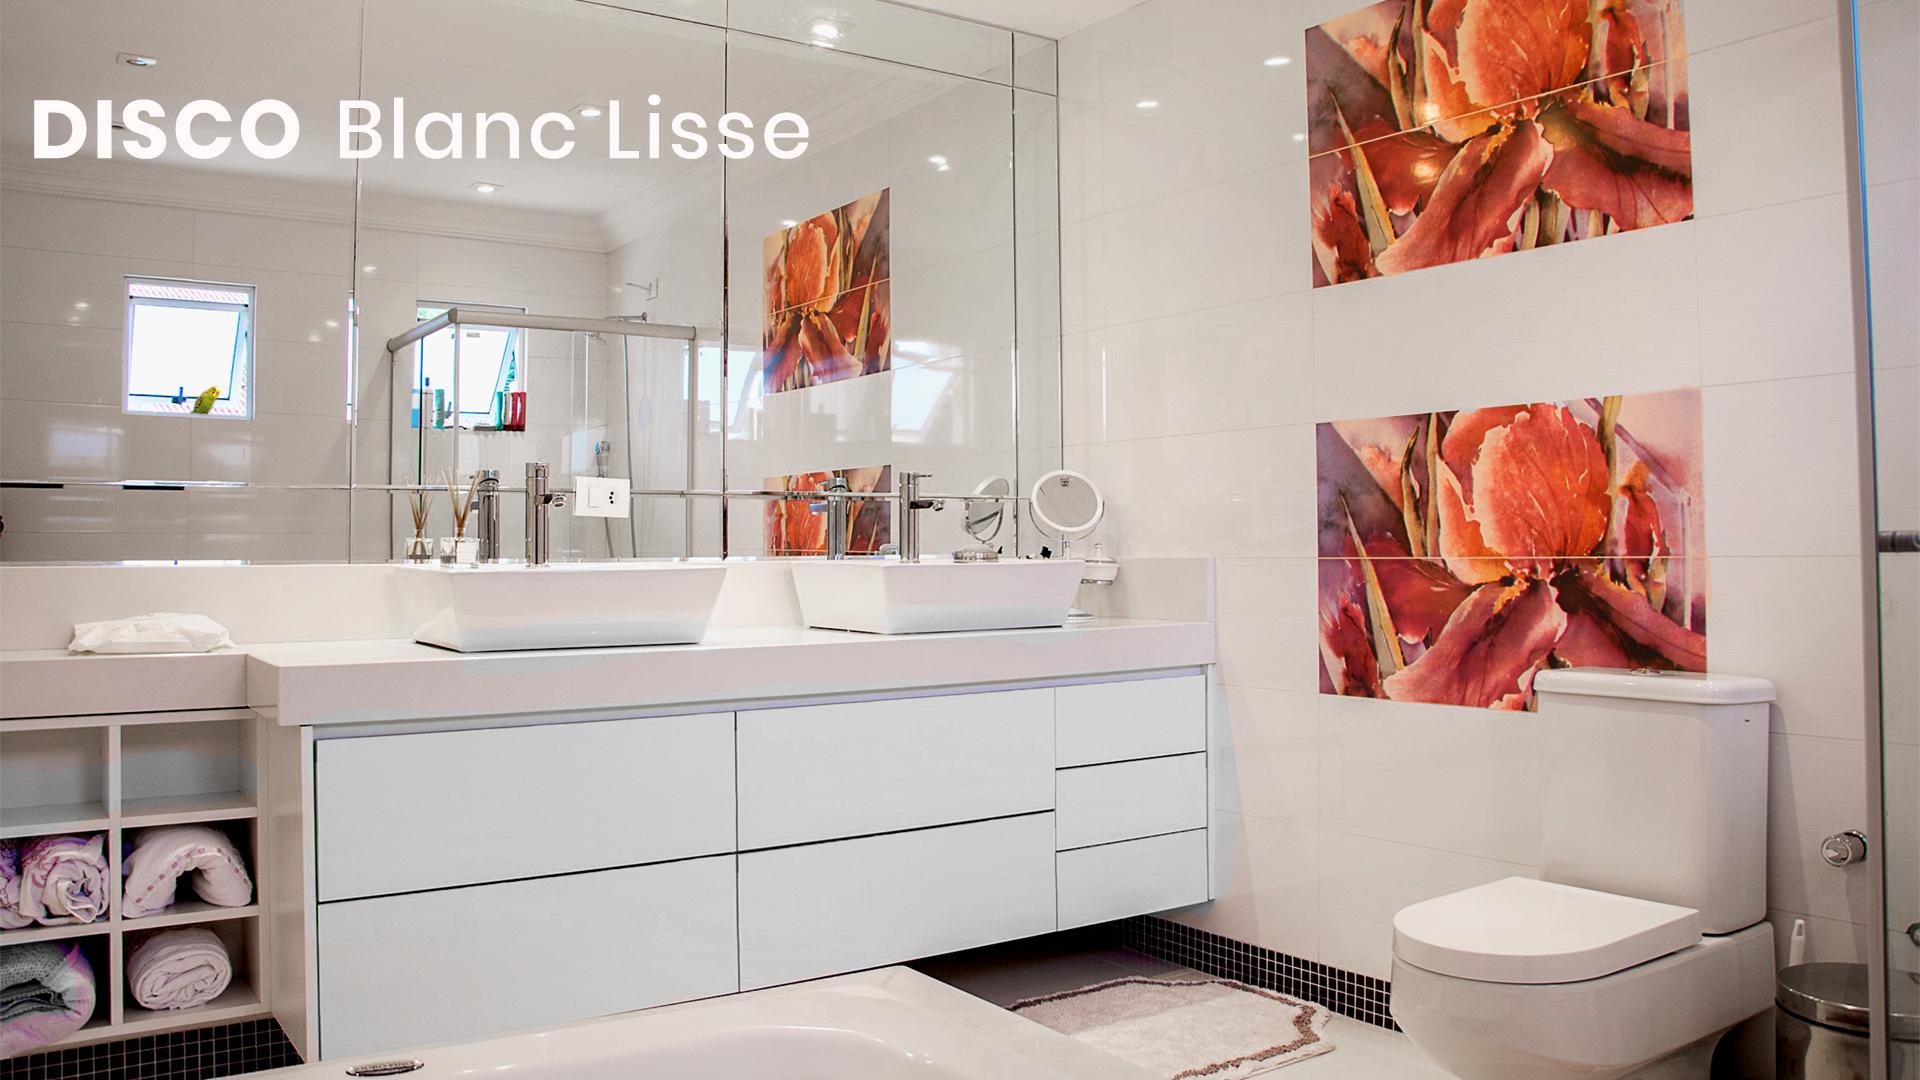 salle de bain disco blanc lisse